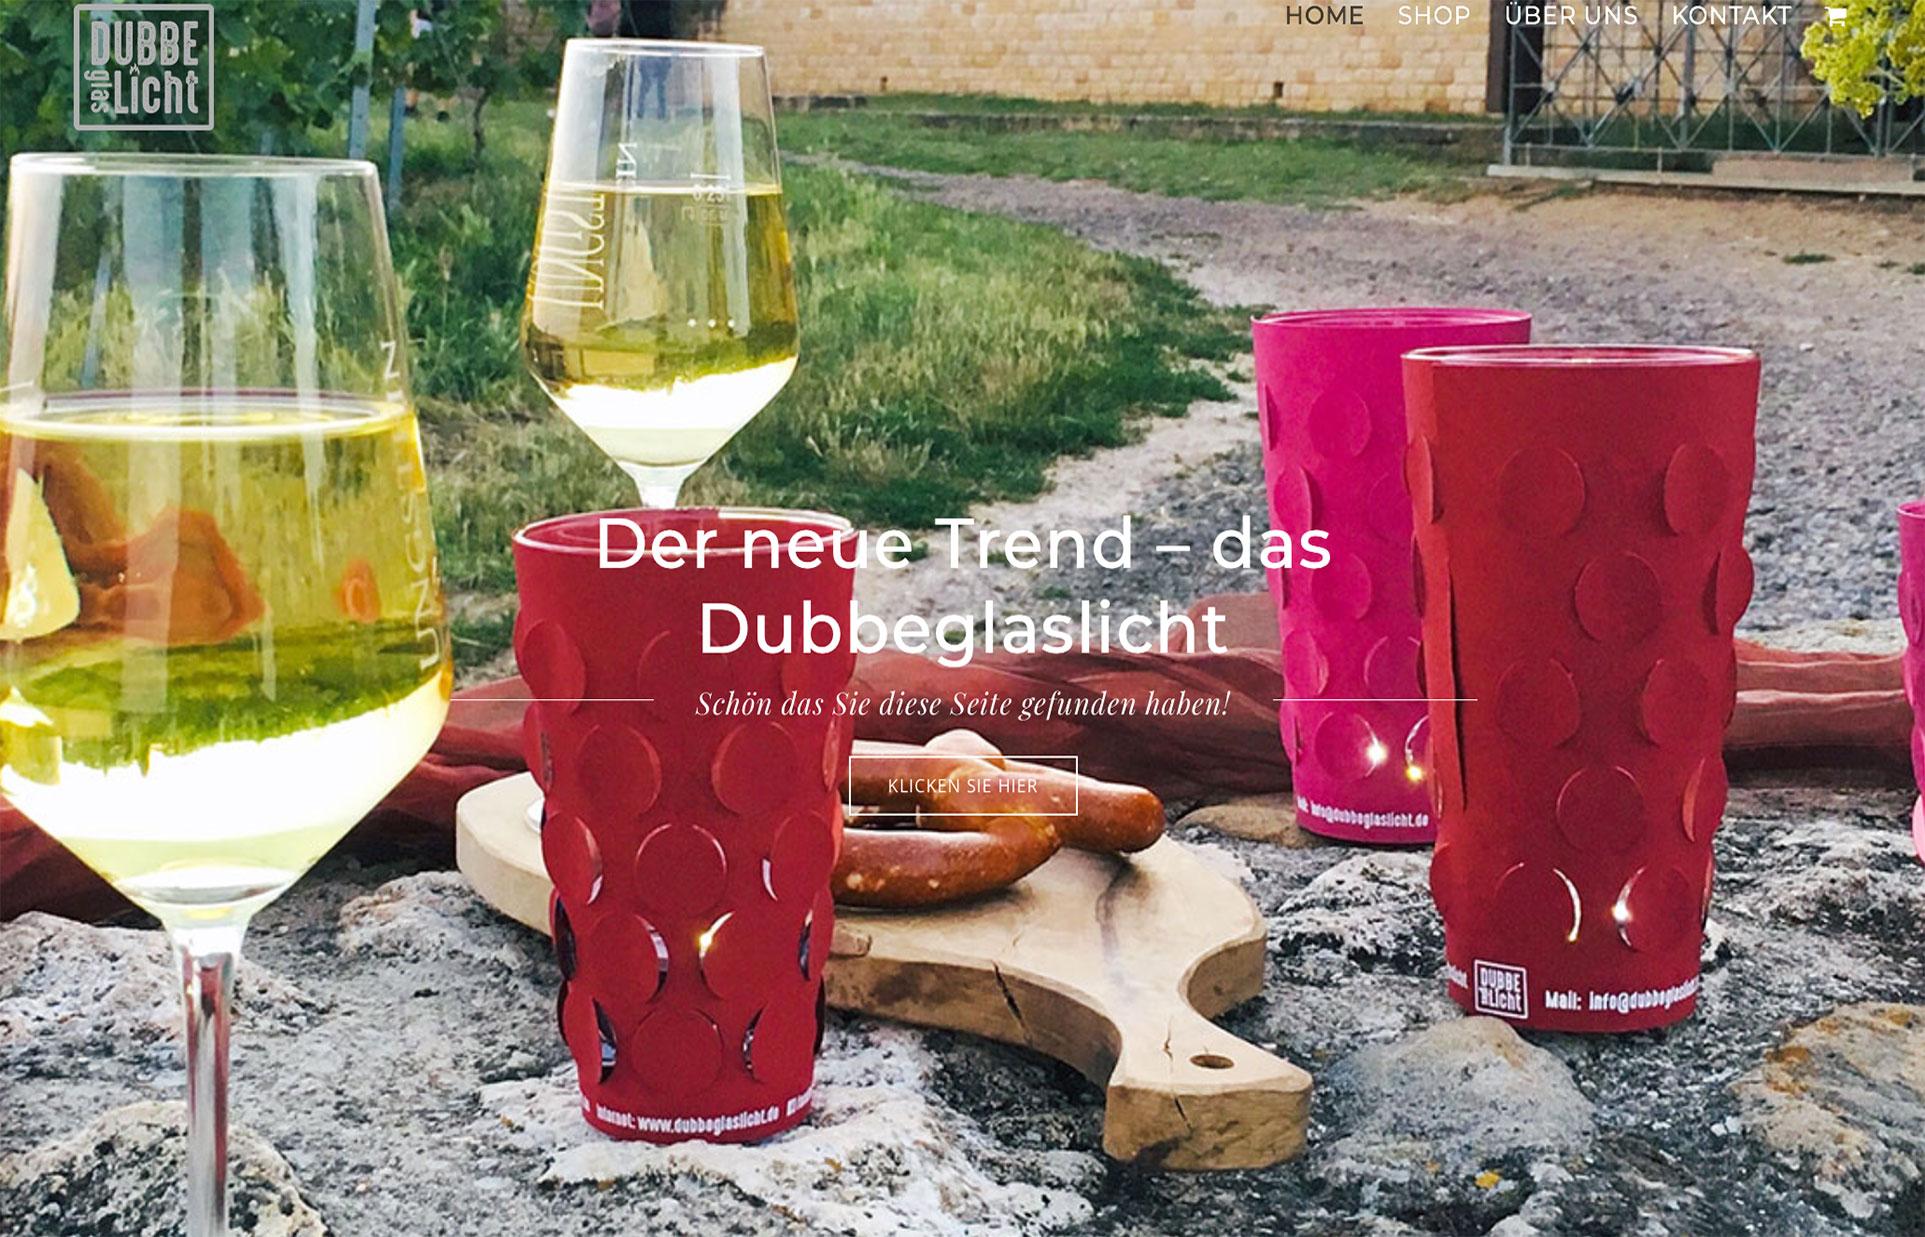 Onlineshop Dubbeglaslicht.de